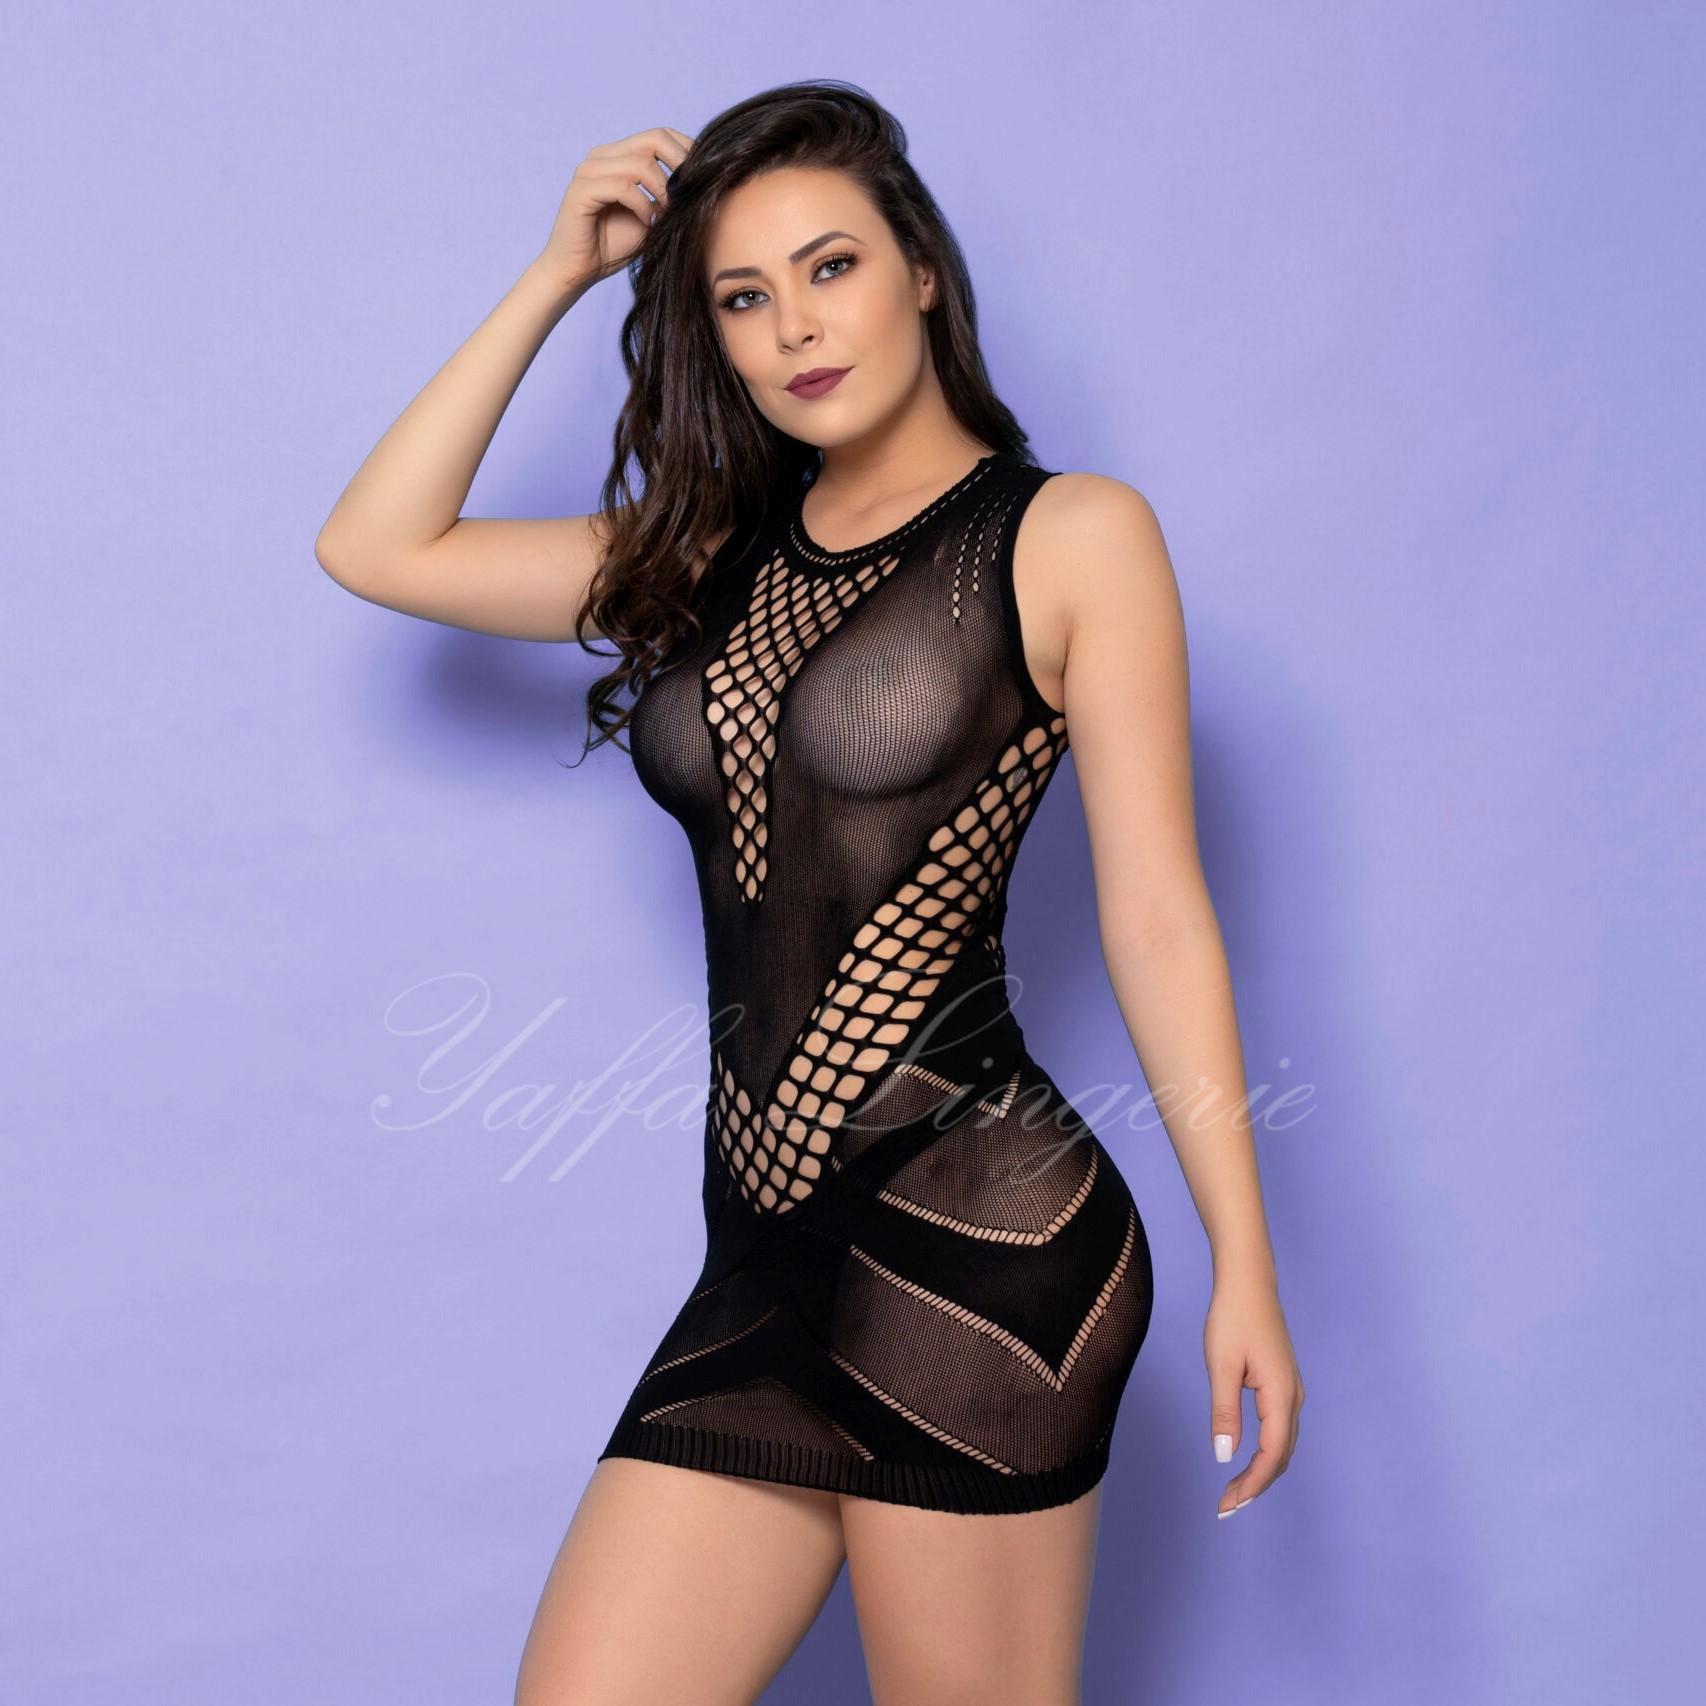 Mini Vestido com Aberturas e Transparência - Y1018